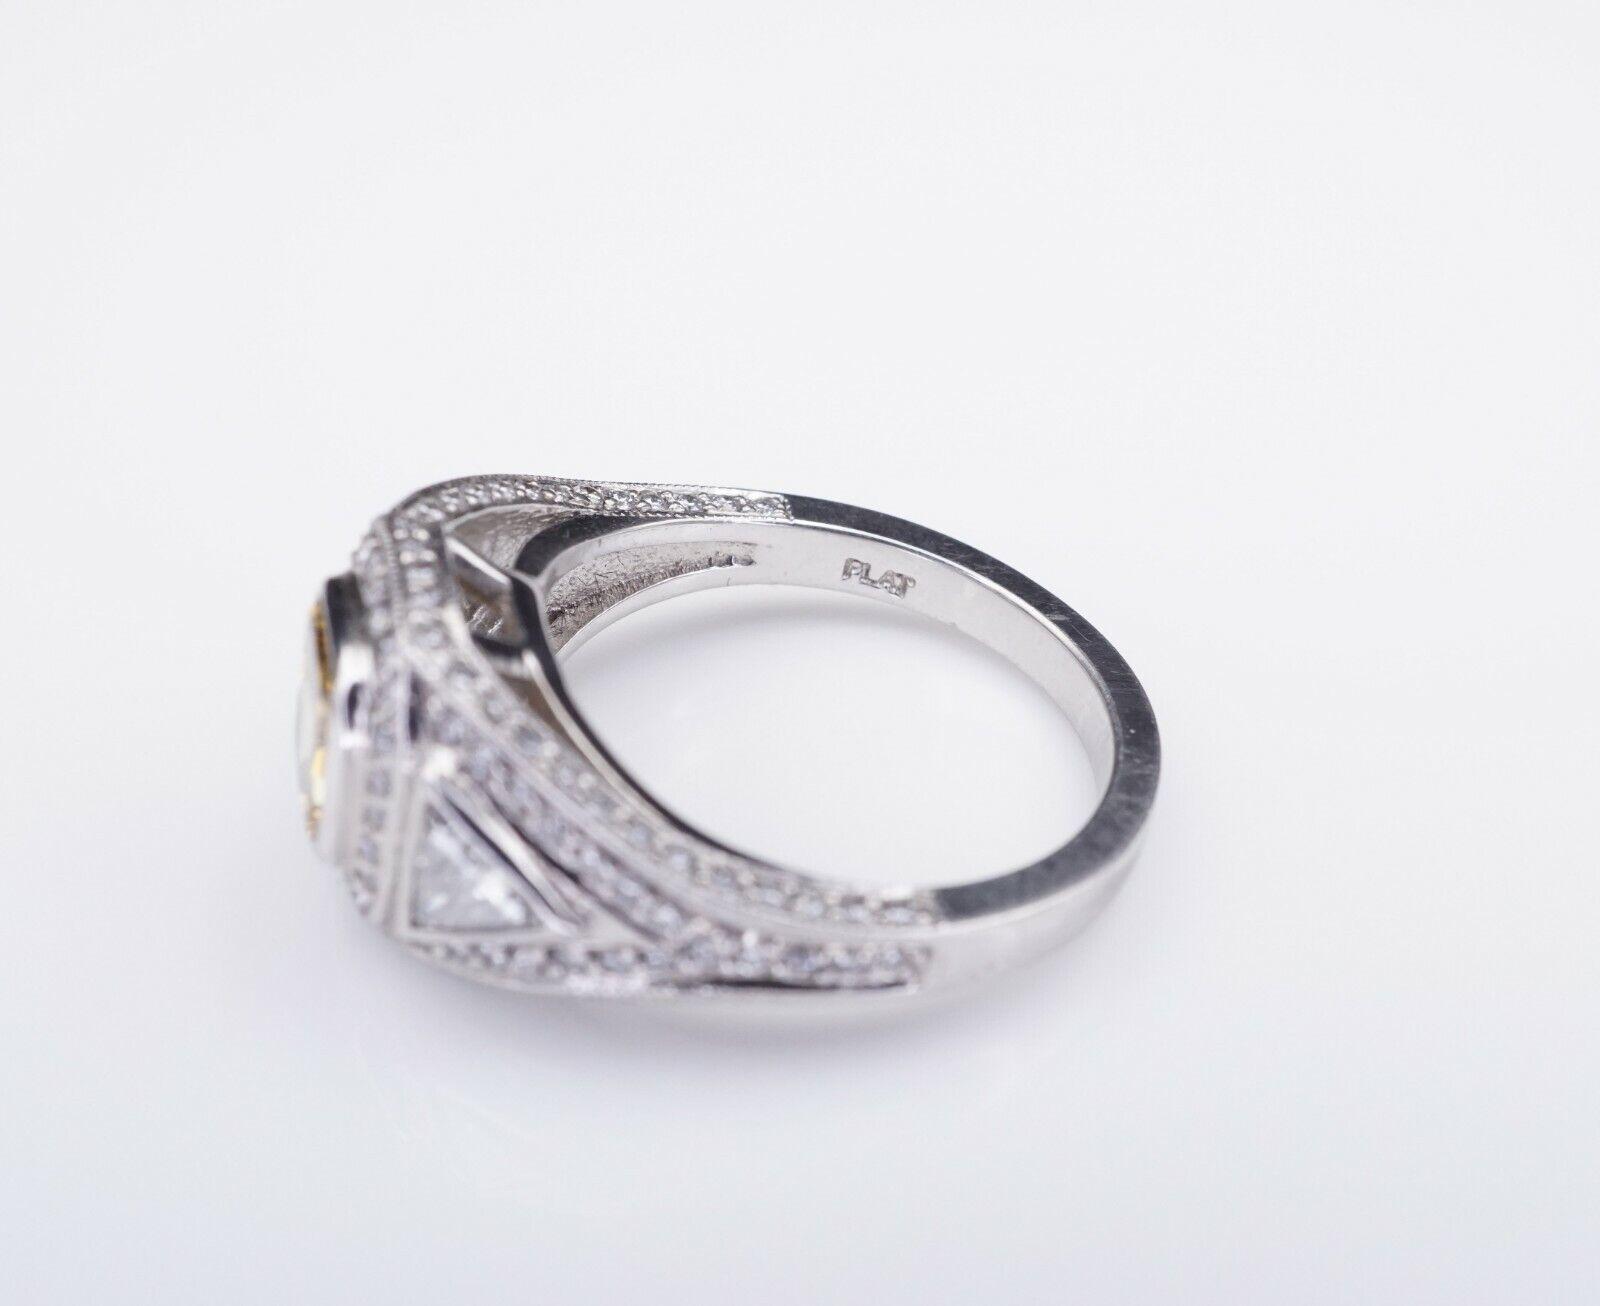 Platinum 3ct Orange-Yellow Diamond Halo Engagement Ring Size 6.75 GIA CO450 6